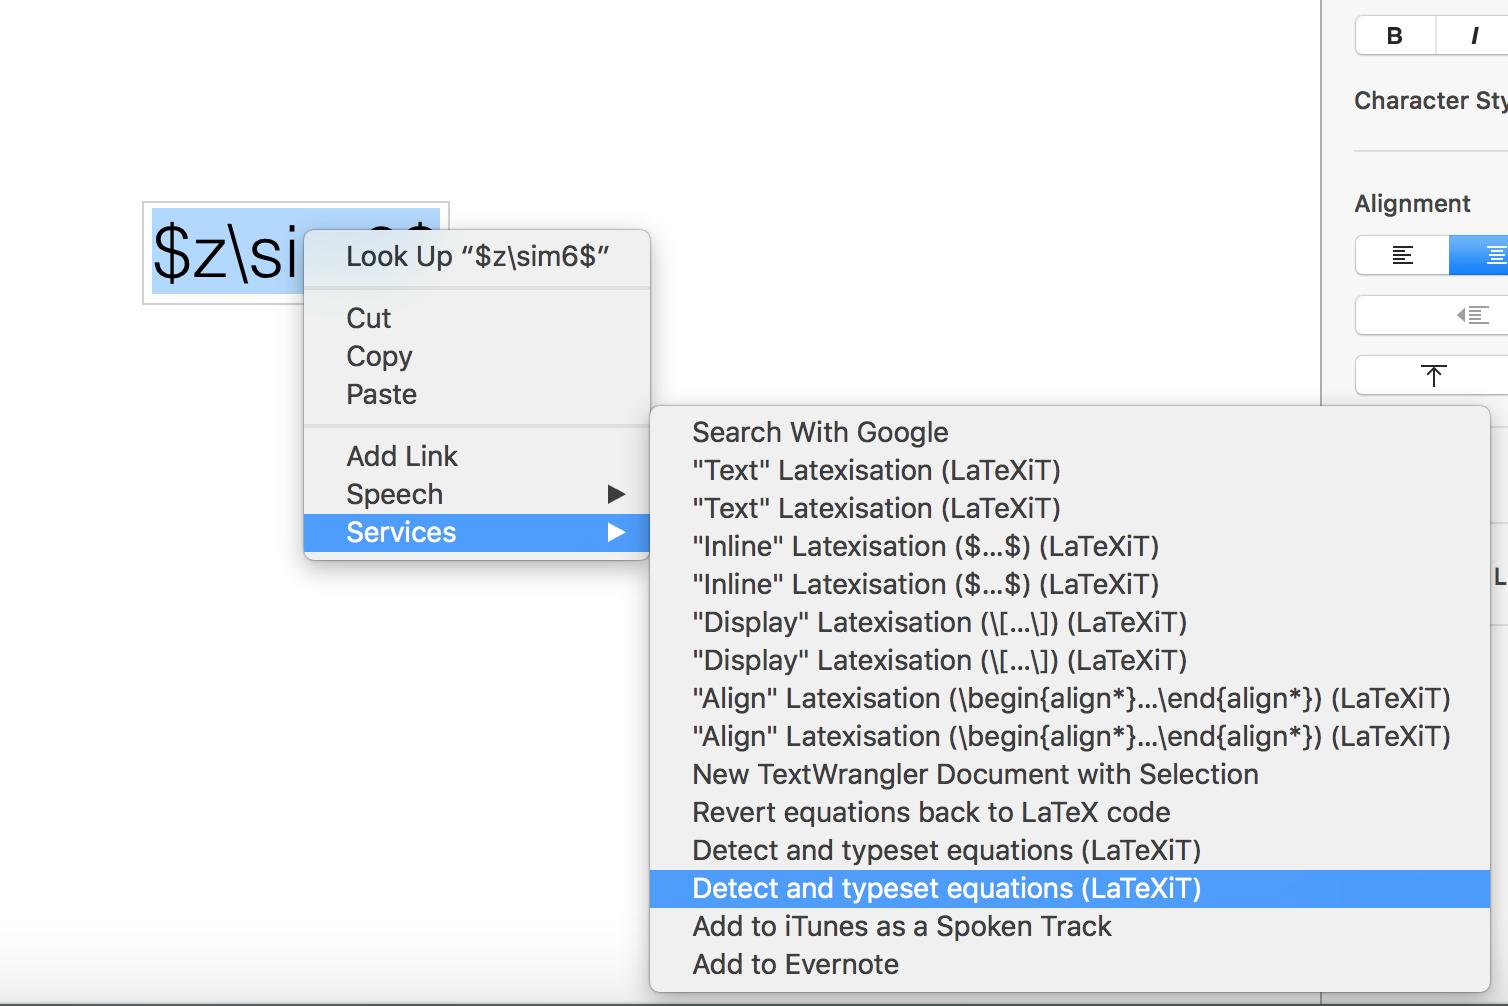 Latexit Service not working on Keynote - Apple Community